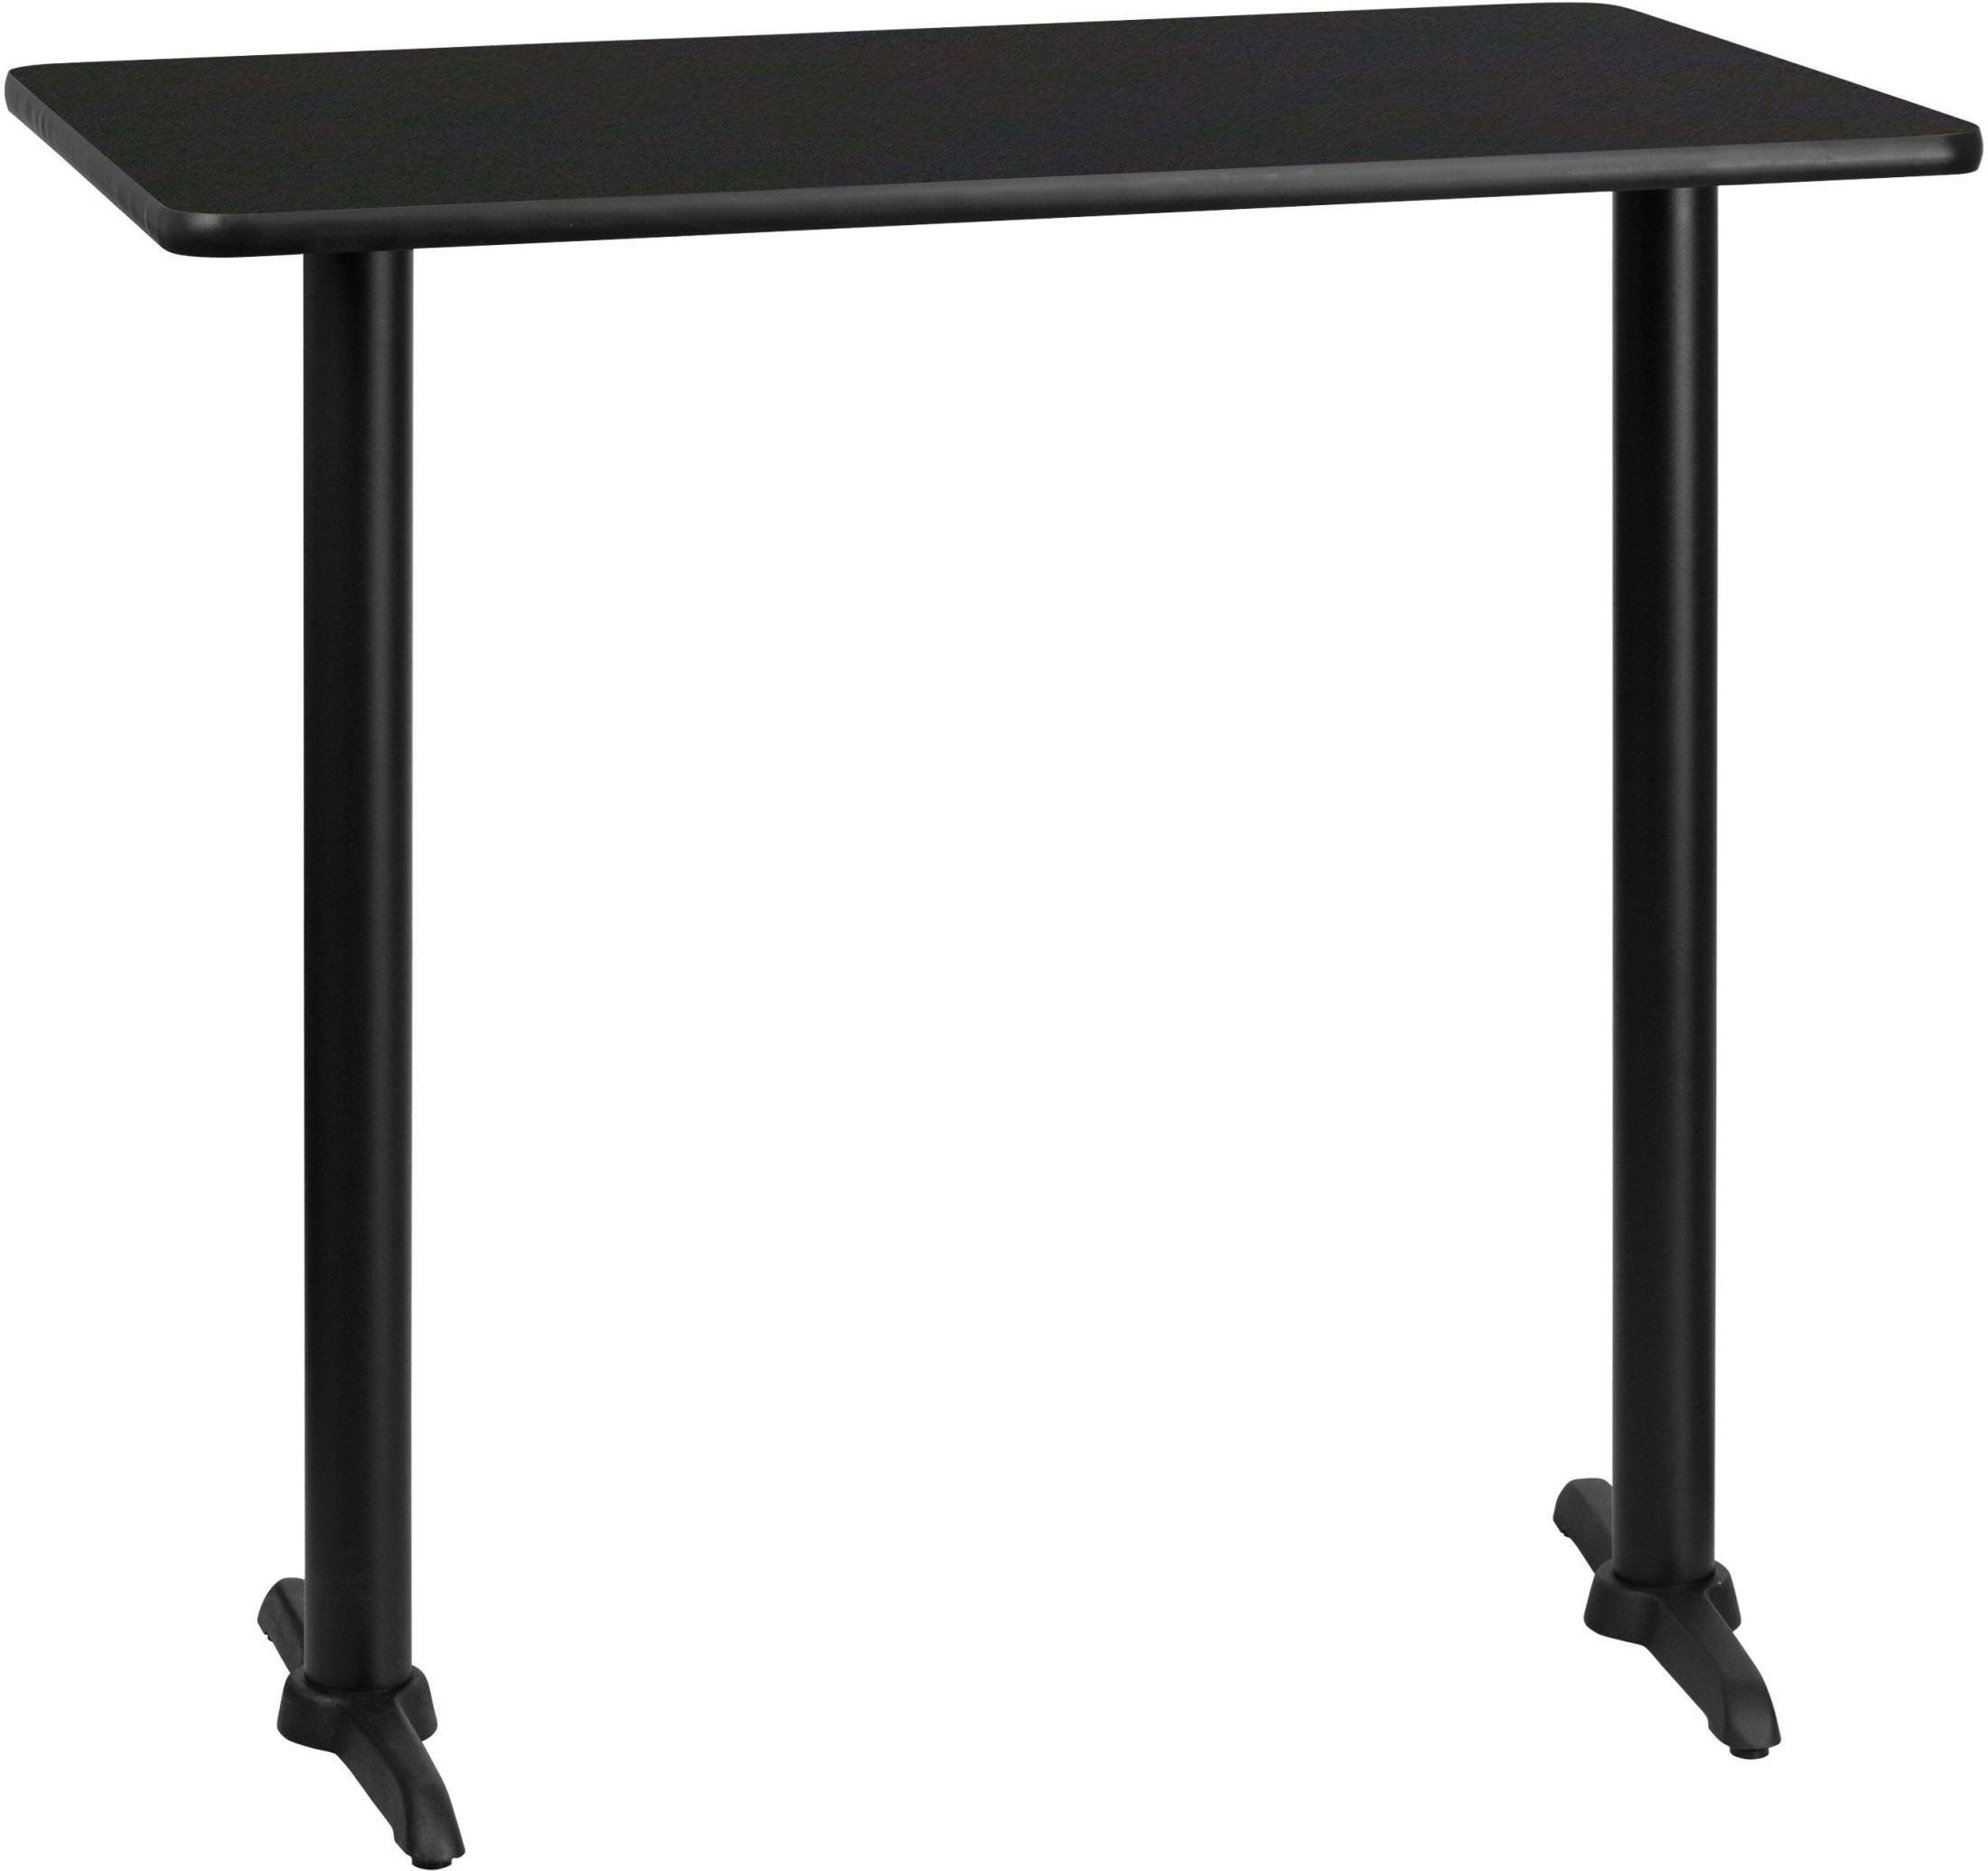 "Rectangular Pub Tables Amazon Com: 42"" Rectangular Black Laminate Table Top With 22"" Bar"